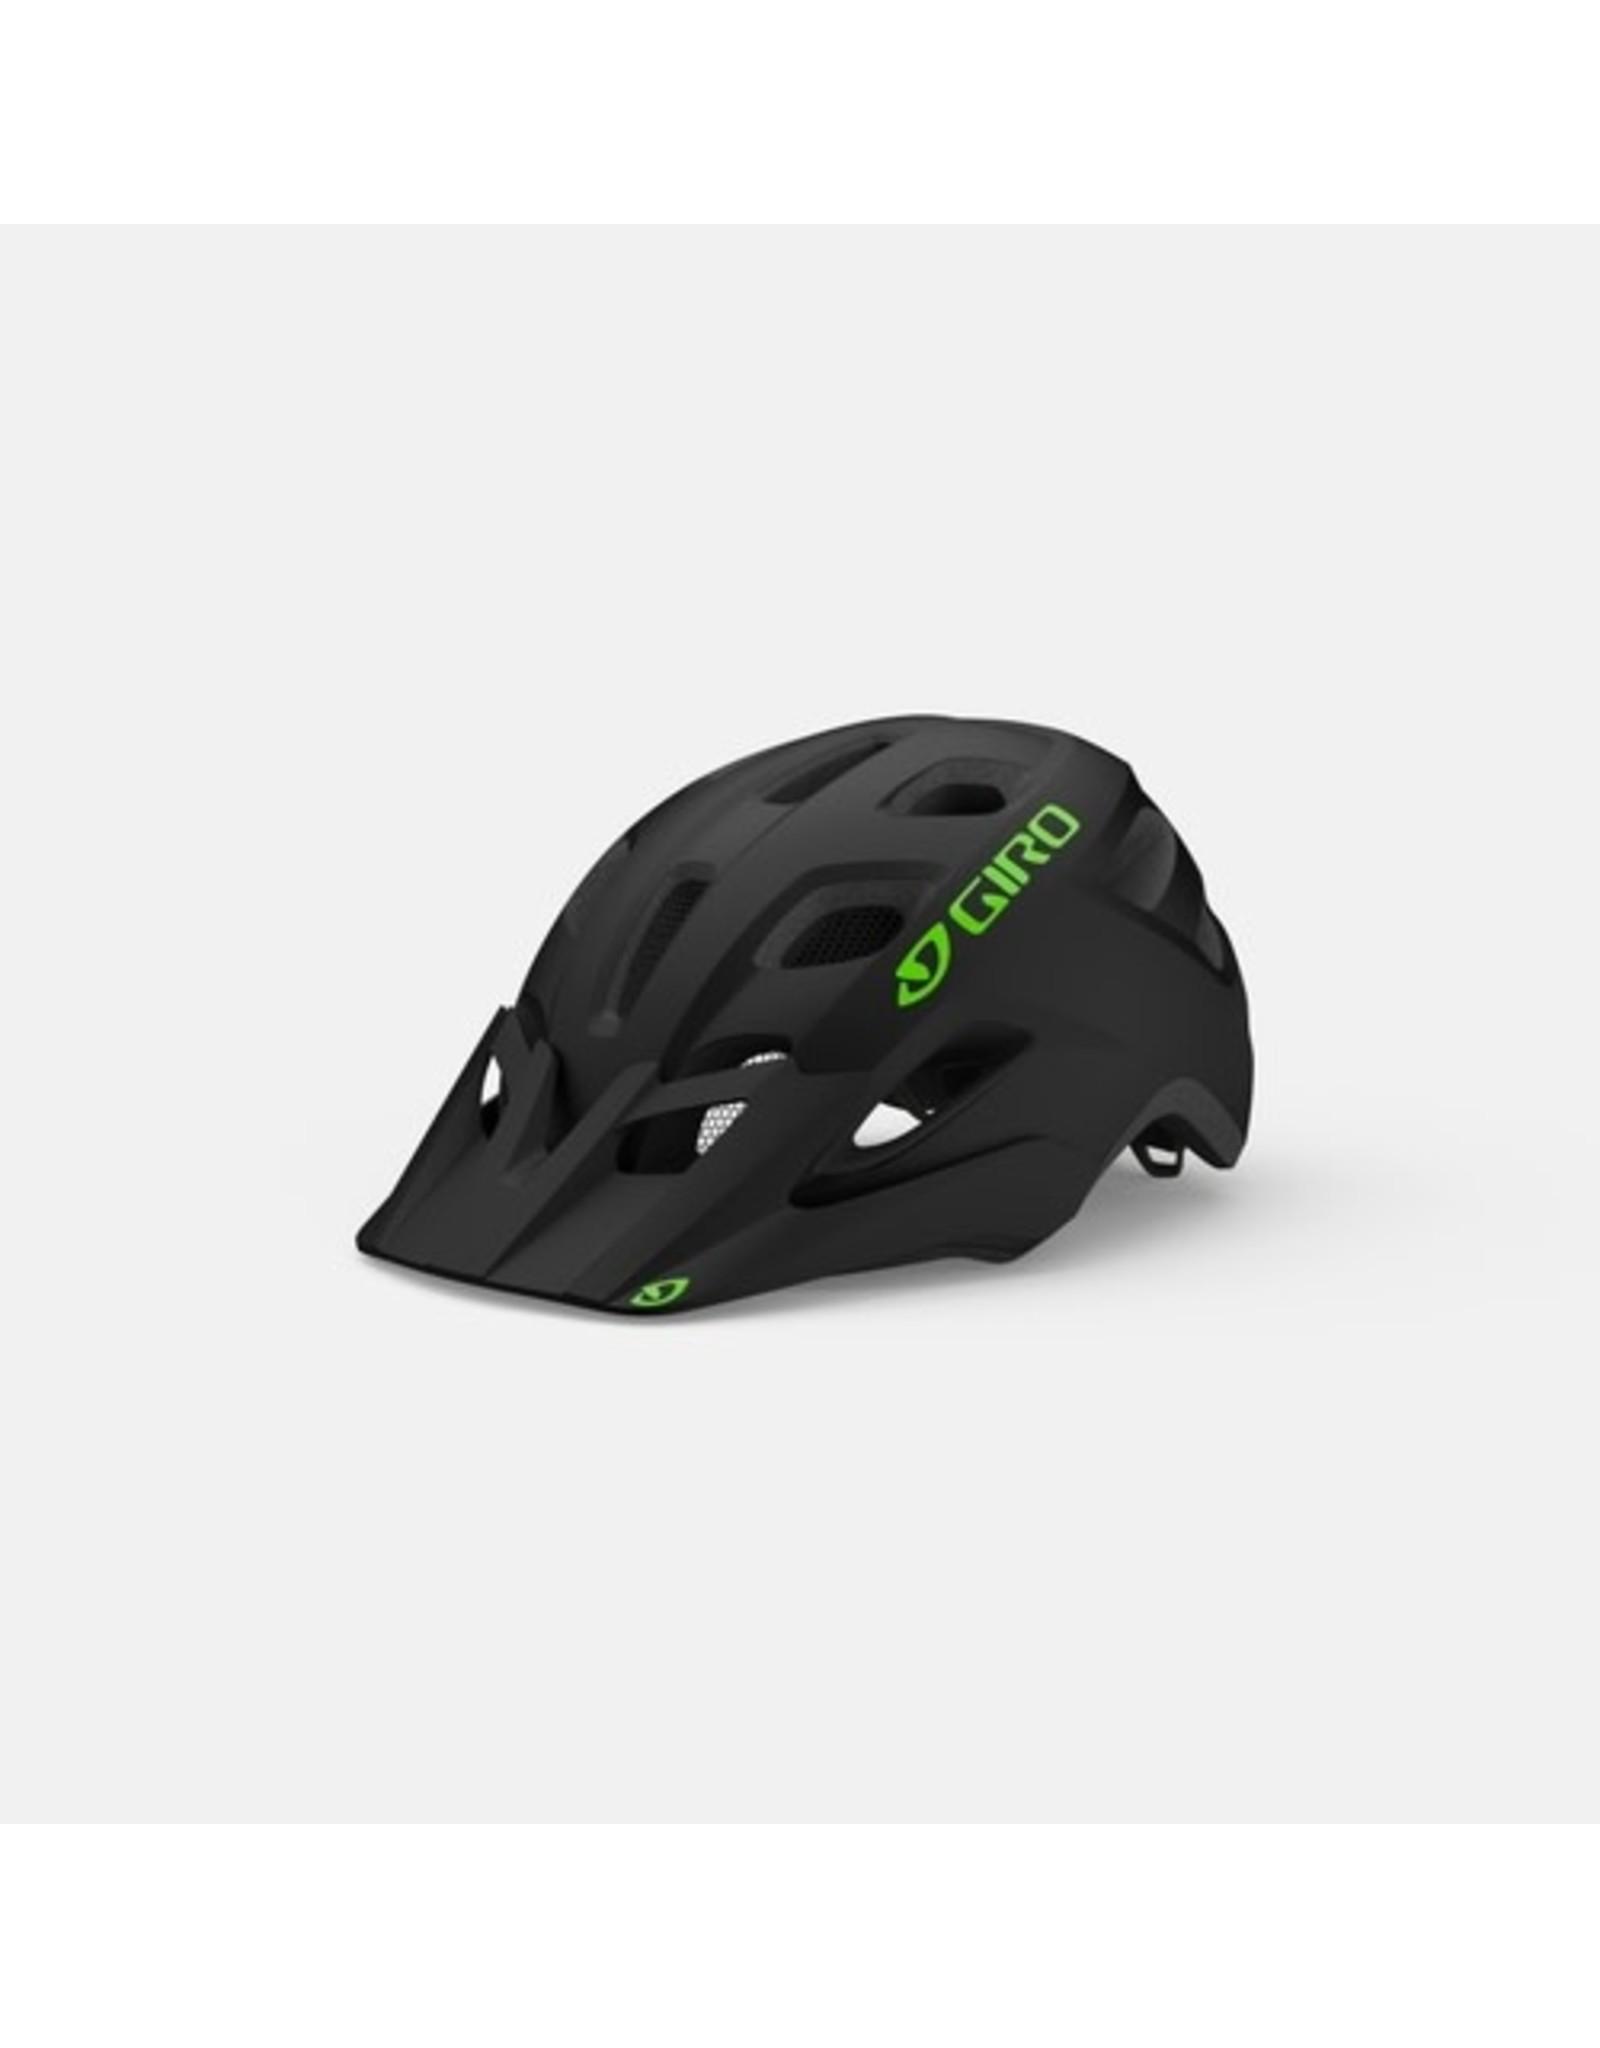 Giro Tremor MIPS Child Helmet